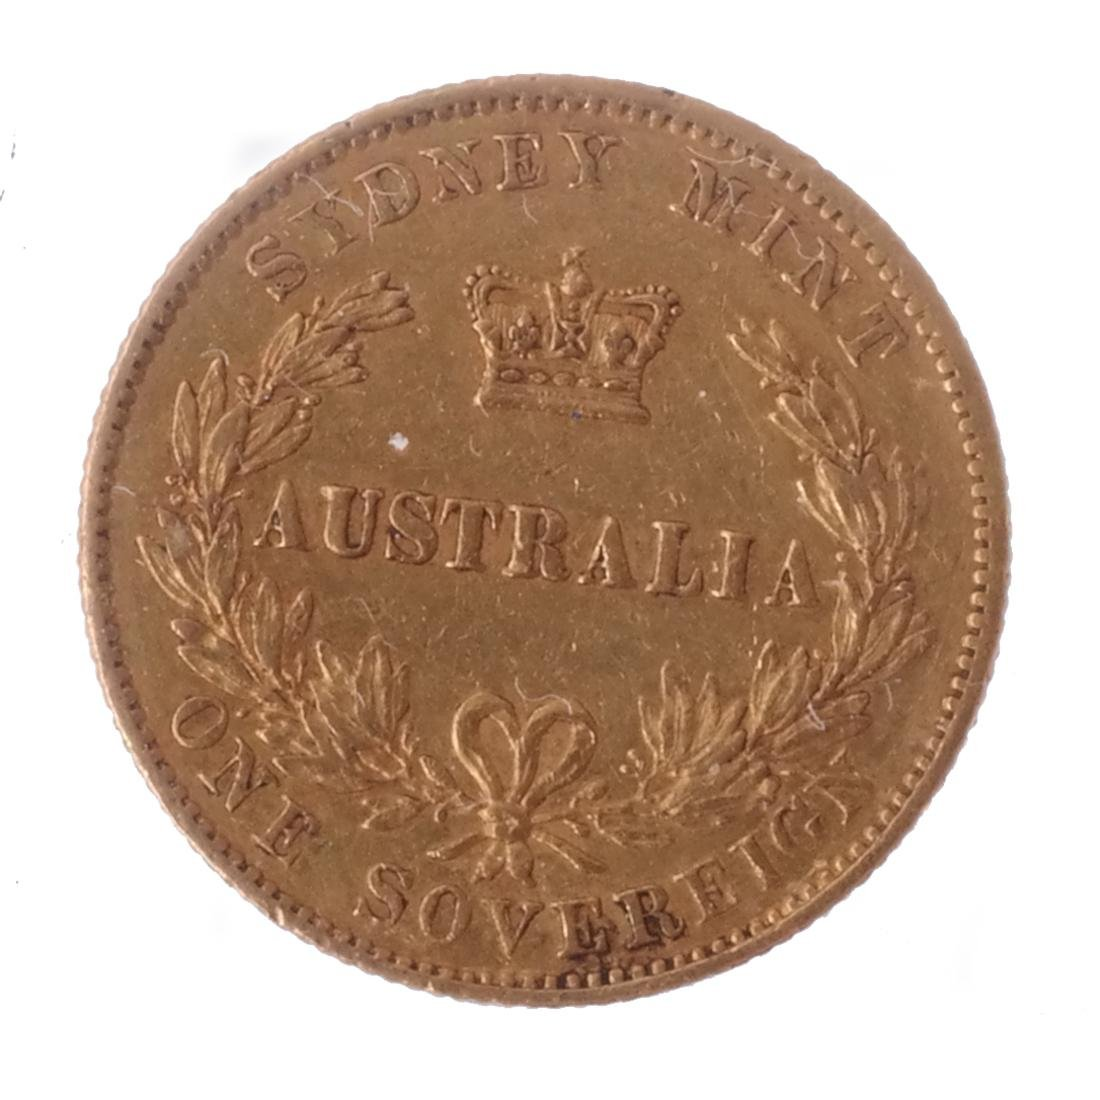 2 Gold, 10 Corona Austria, 1 Australia - 3